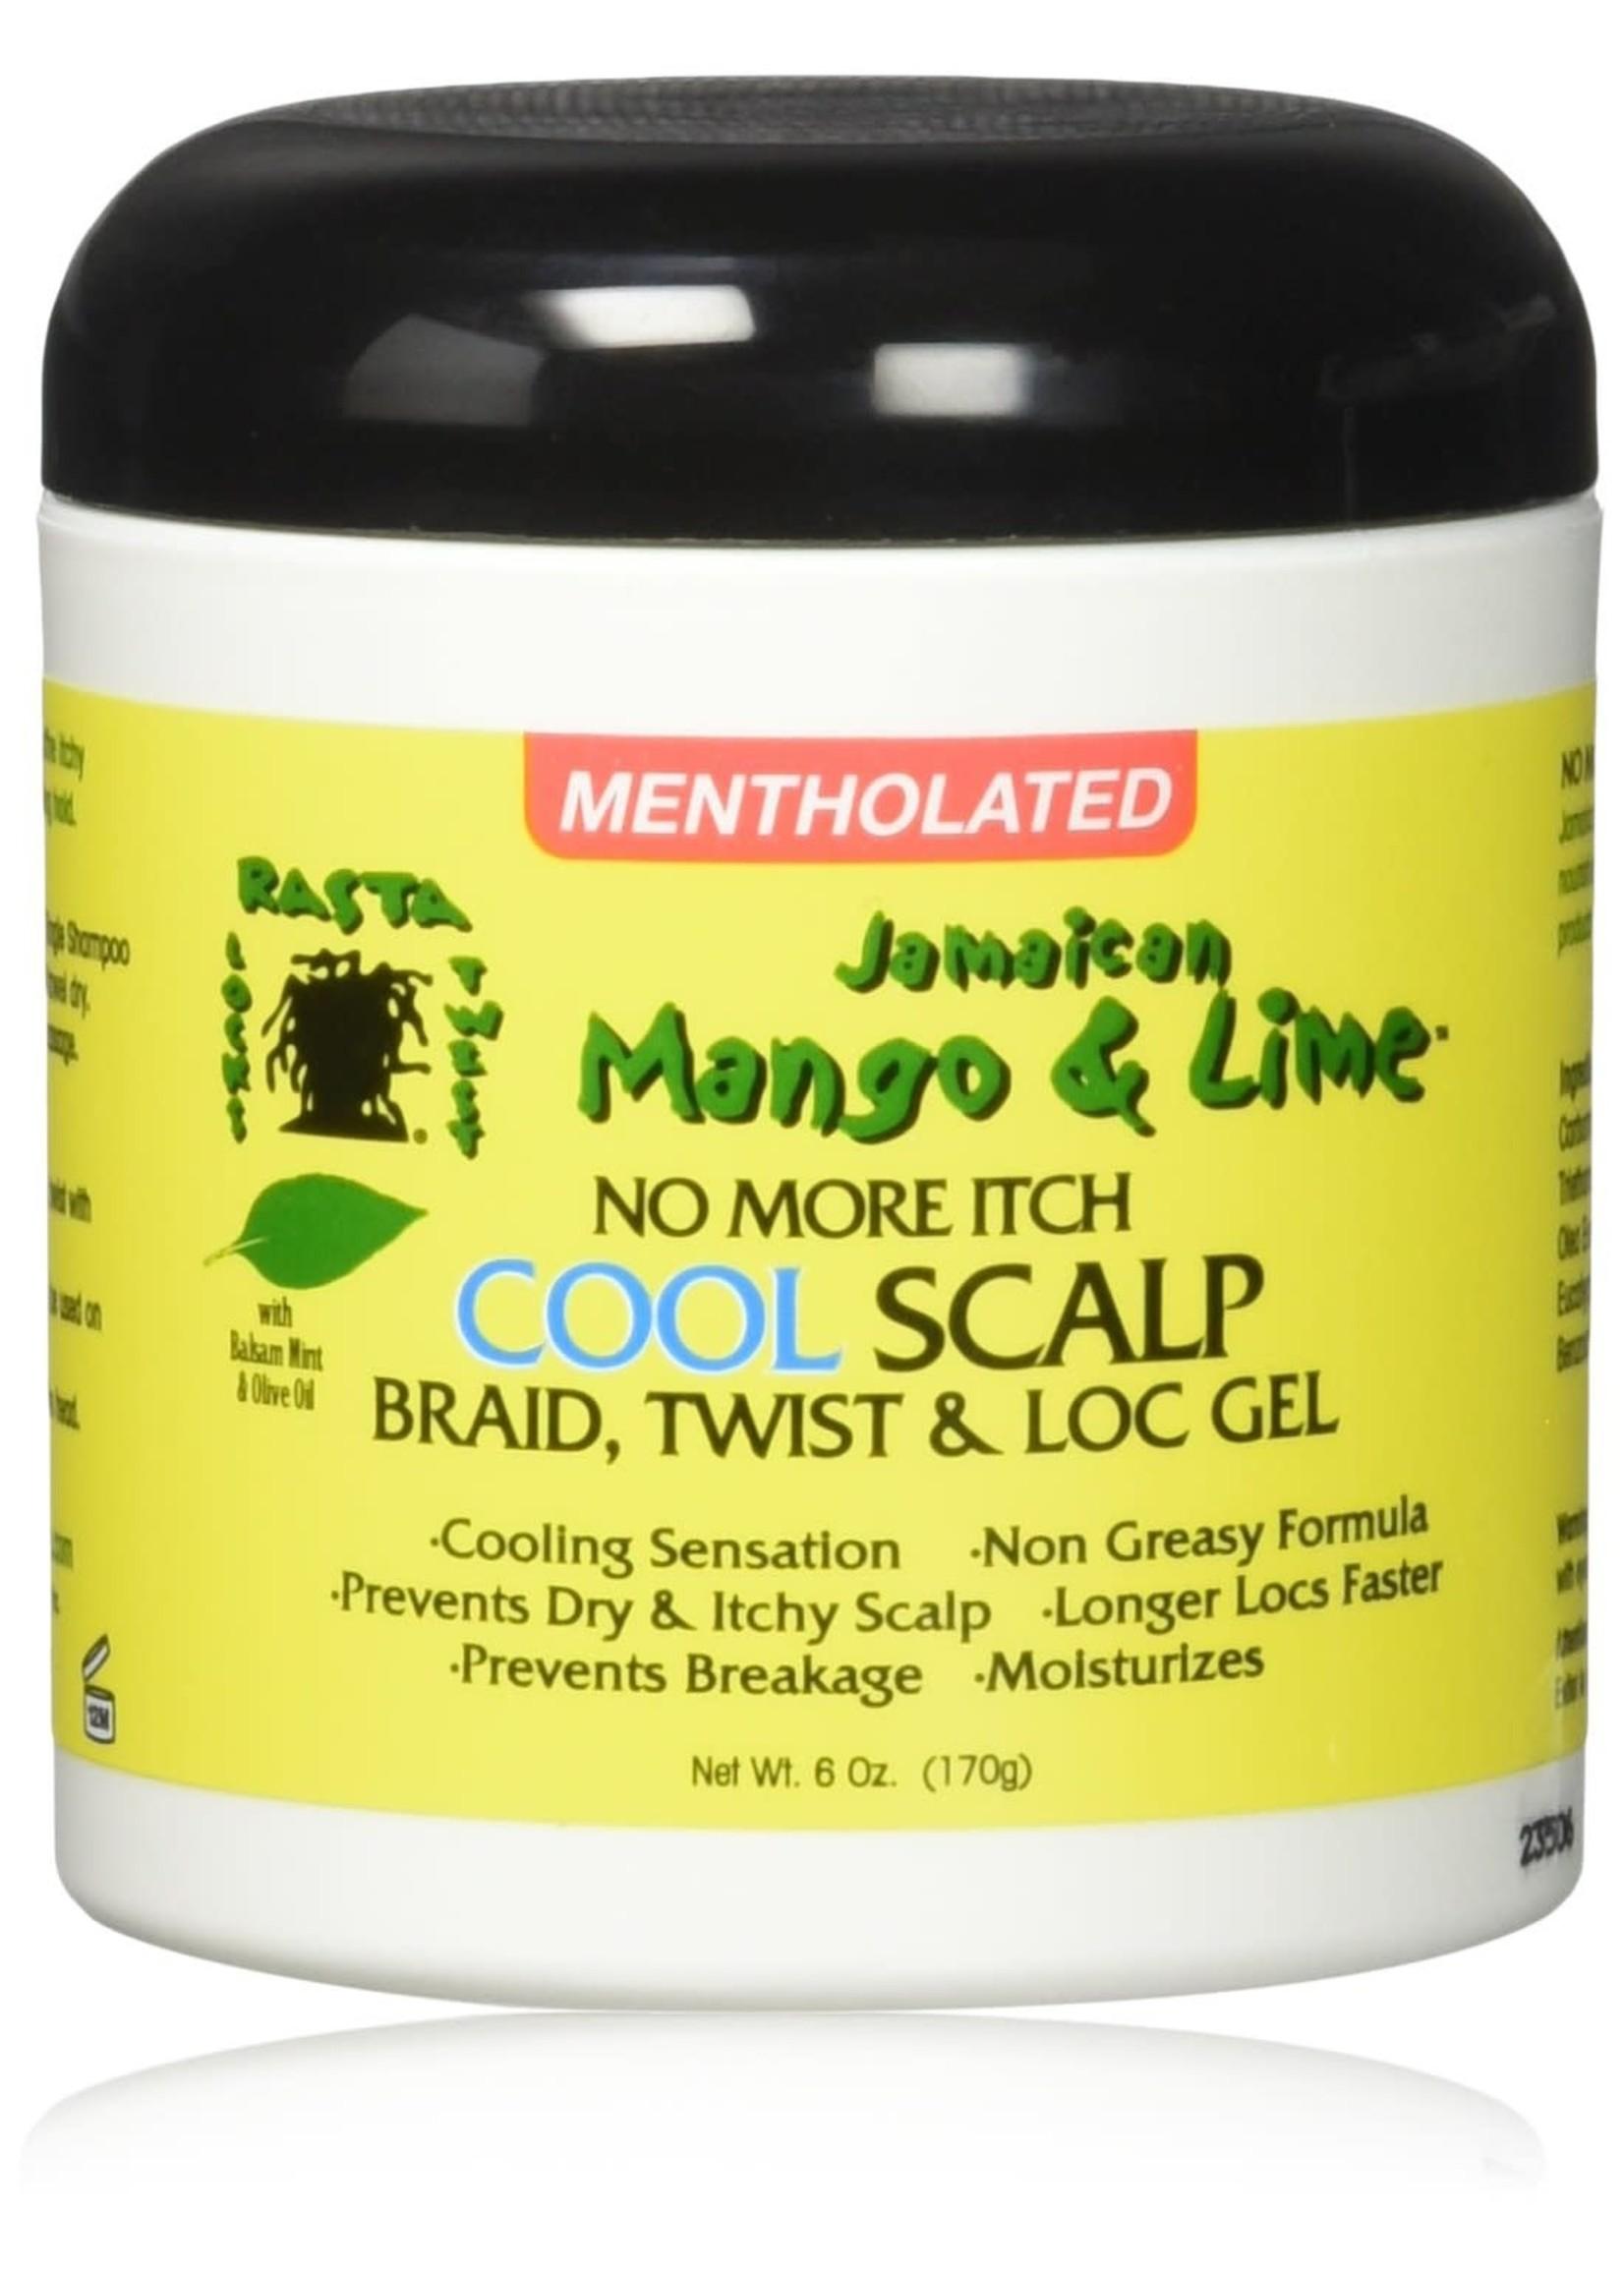 Jamaican Mango Lime No More Itch Cool Scalp 6oz